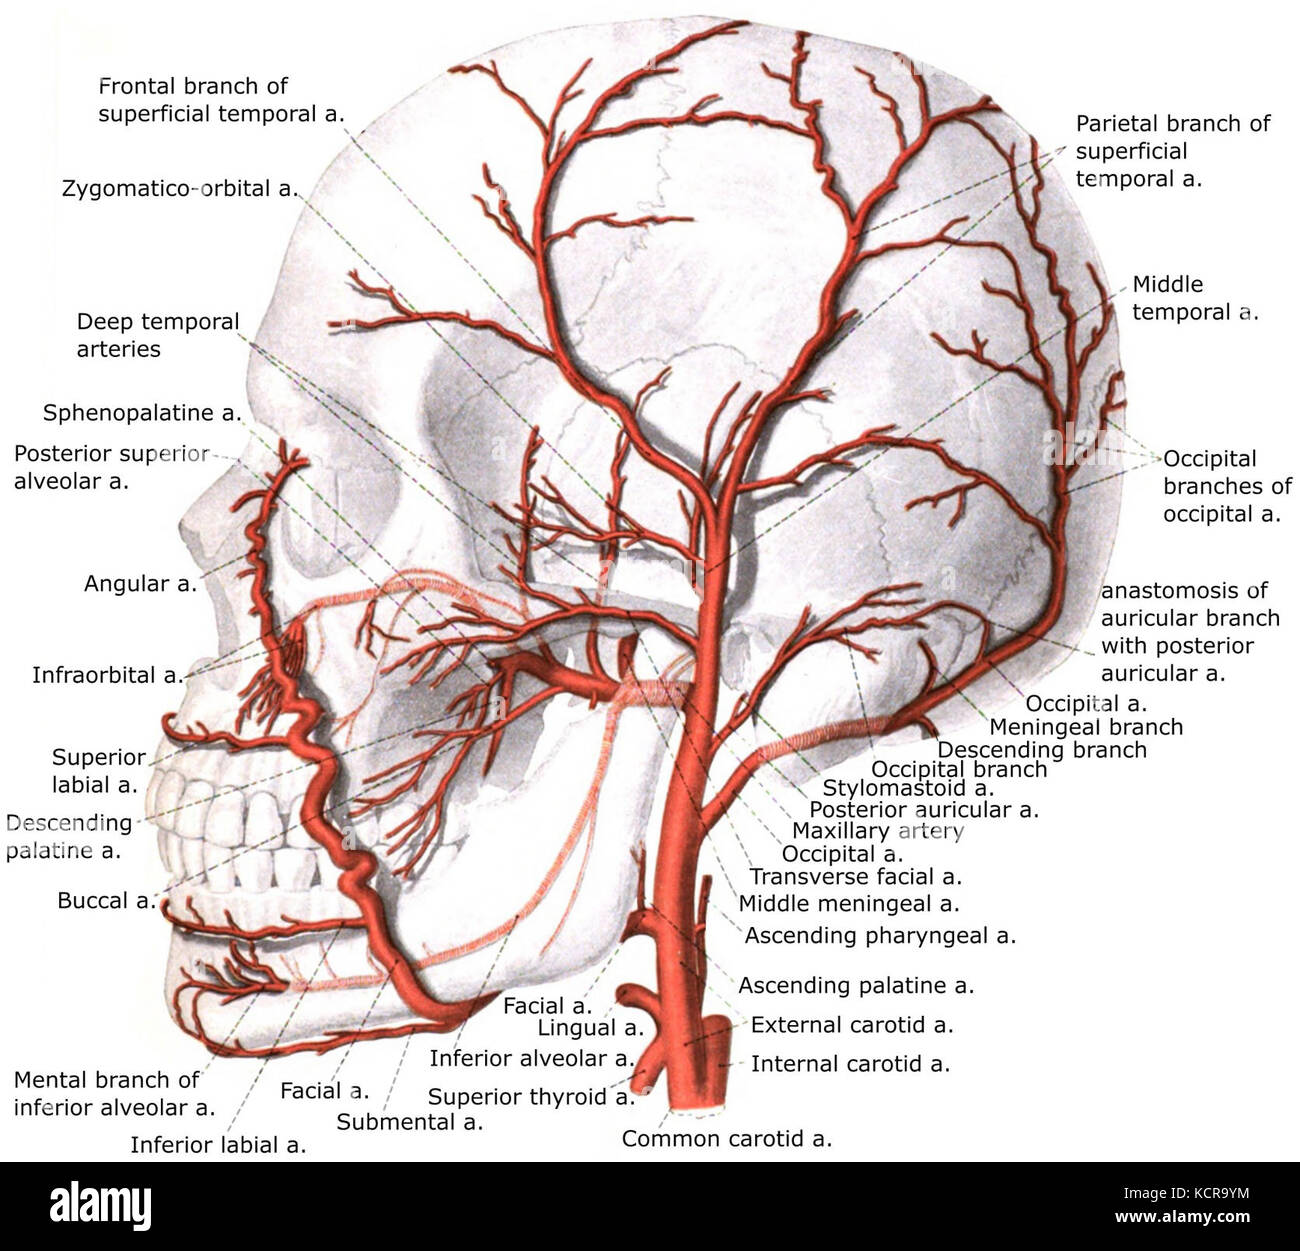 Con ramas de la arteria carótida externa Foto & Imagen De Stock ...